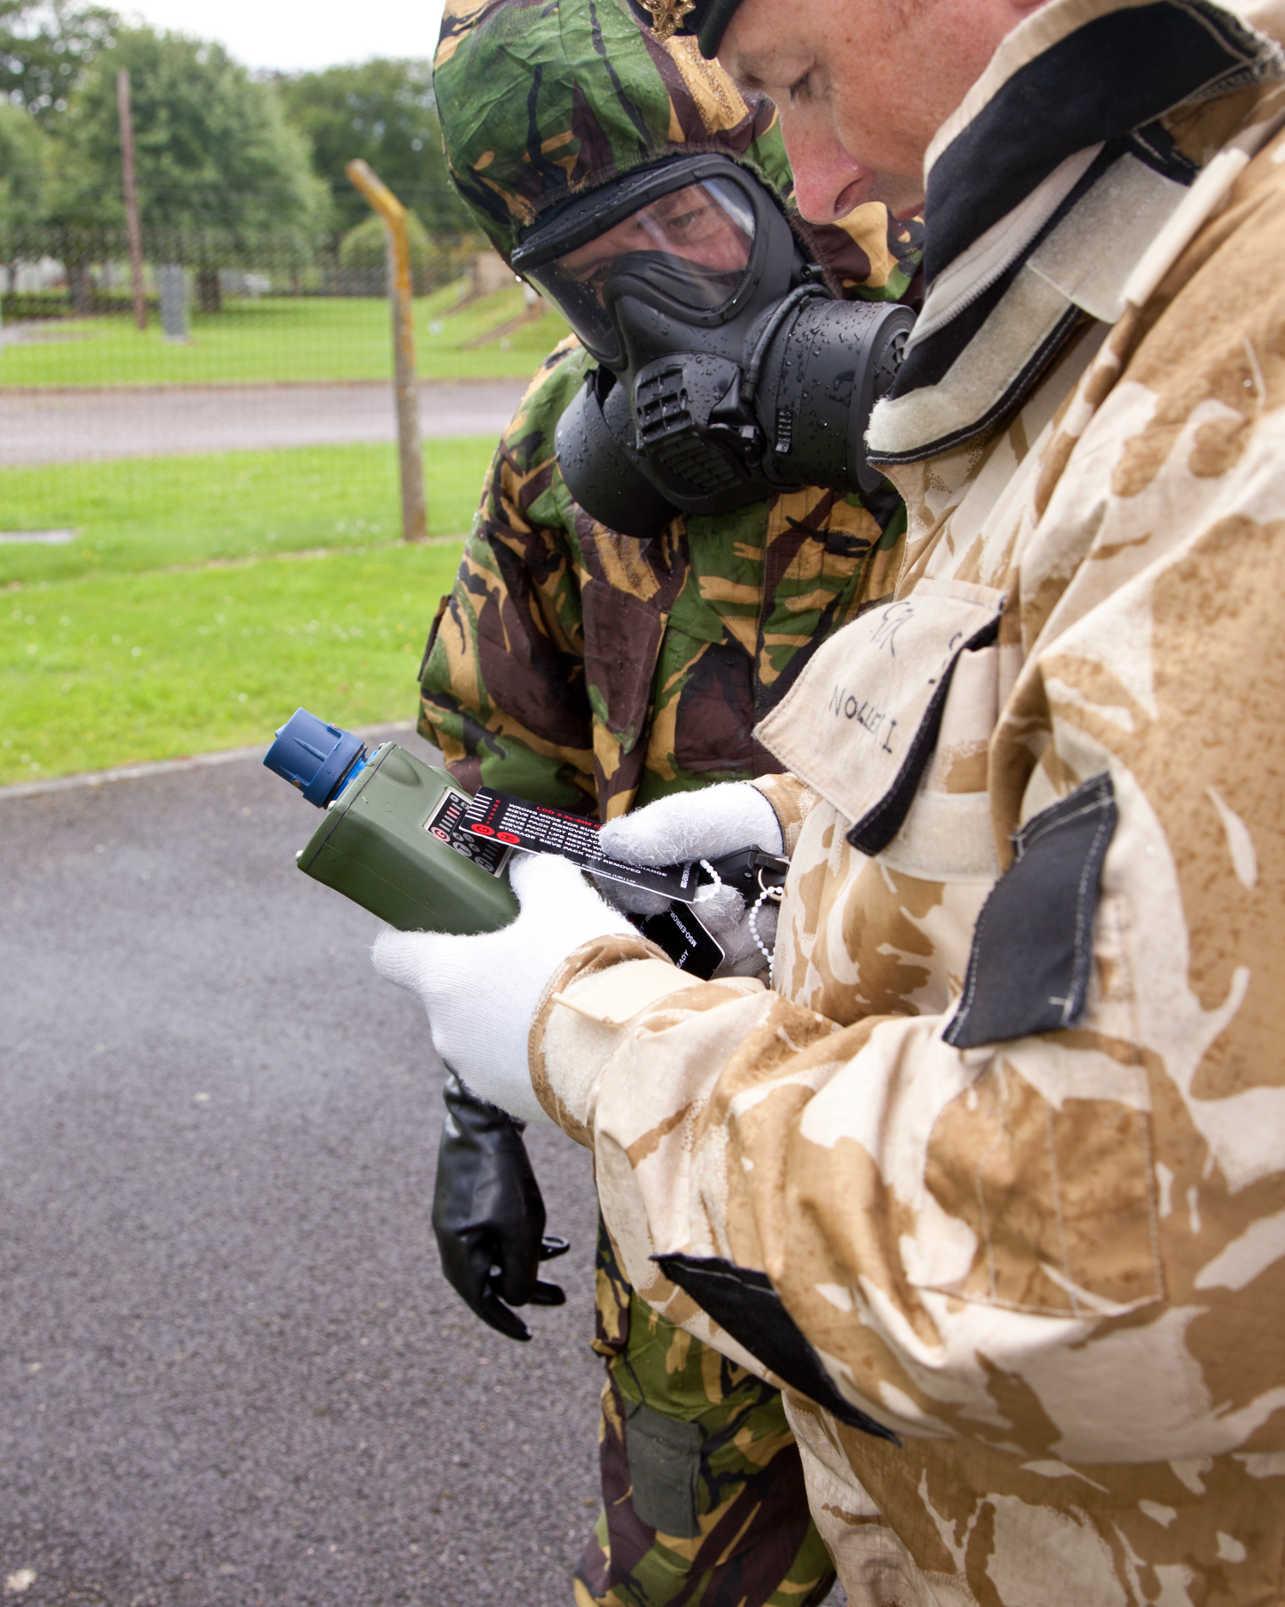 Chemical Hazard Detection Solutions for CBRNe HazMat Training